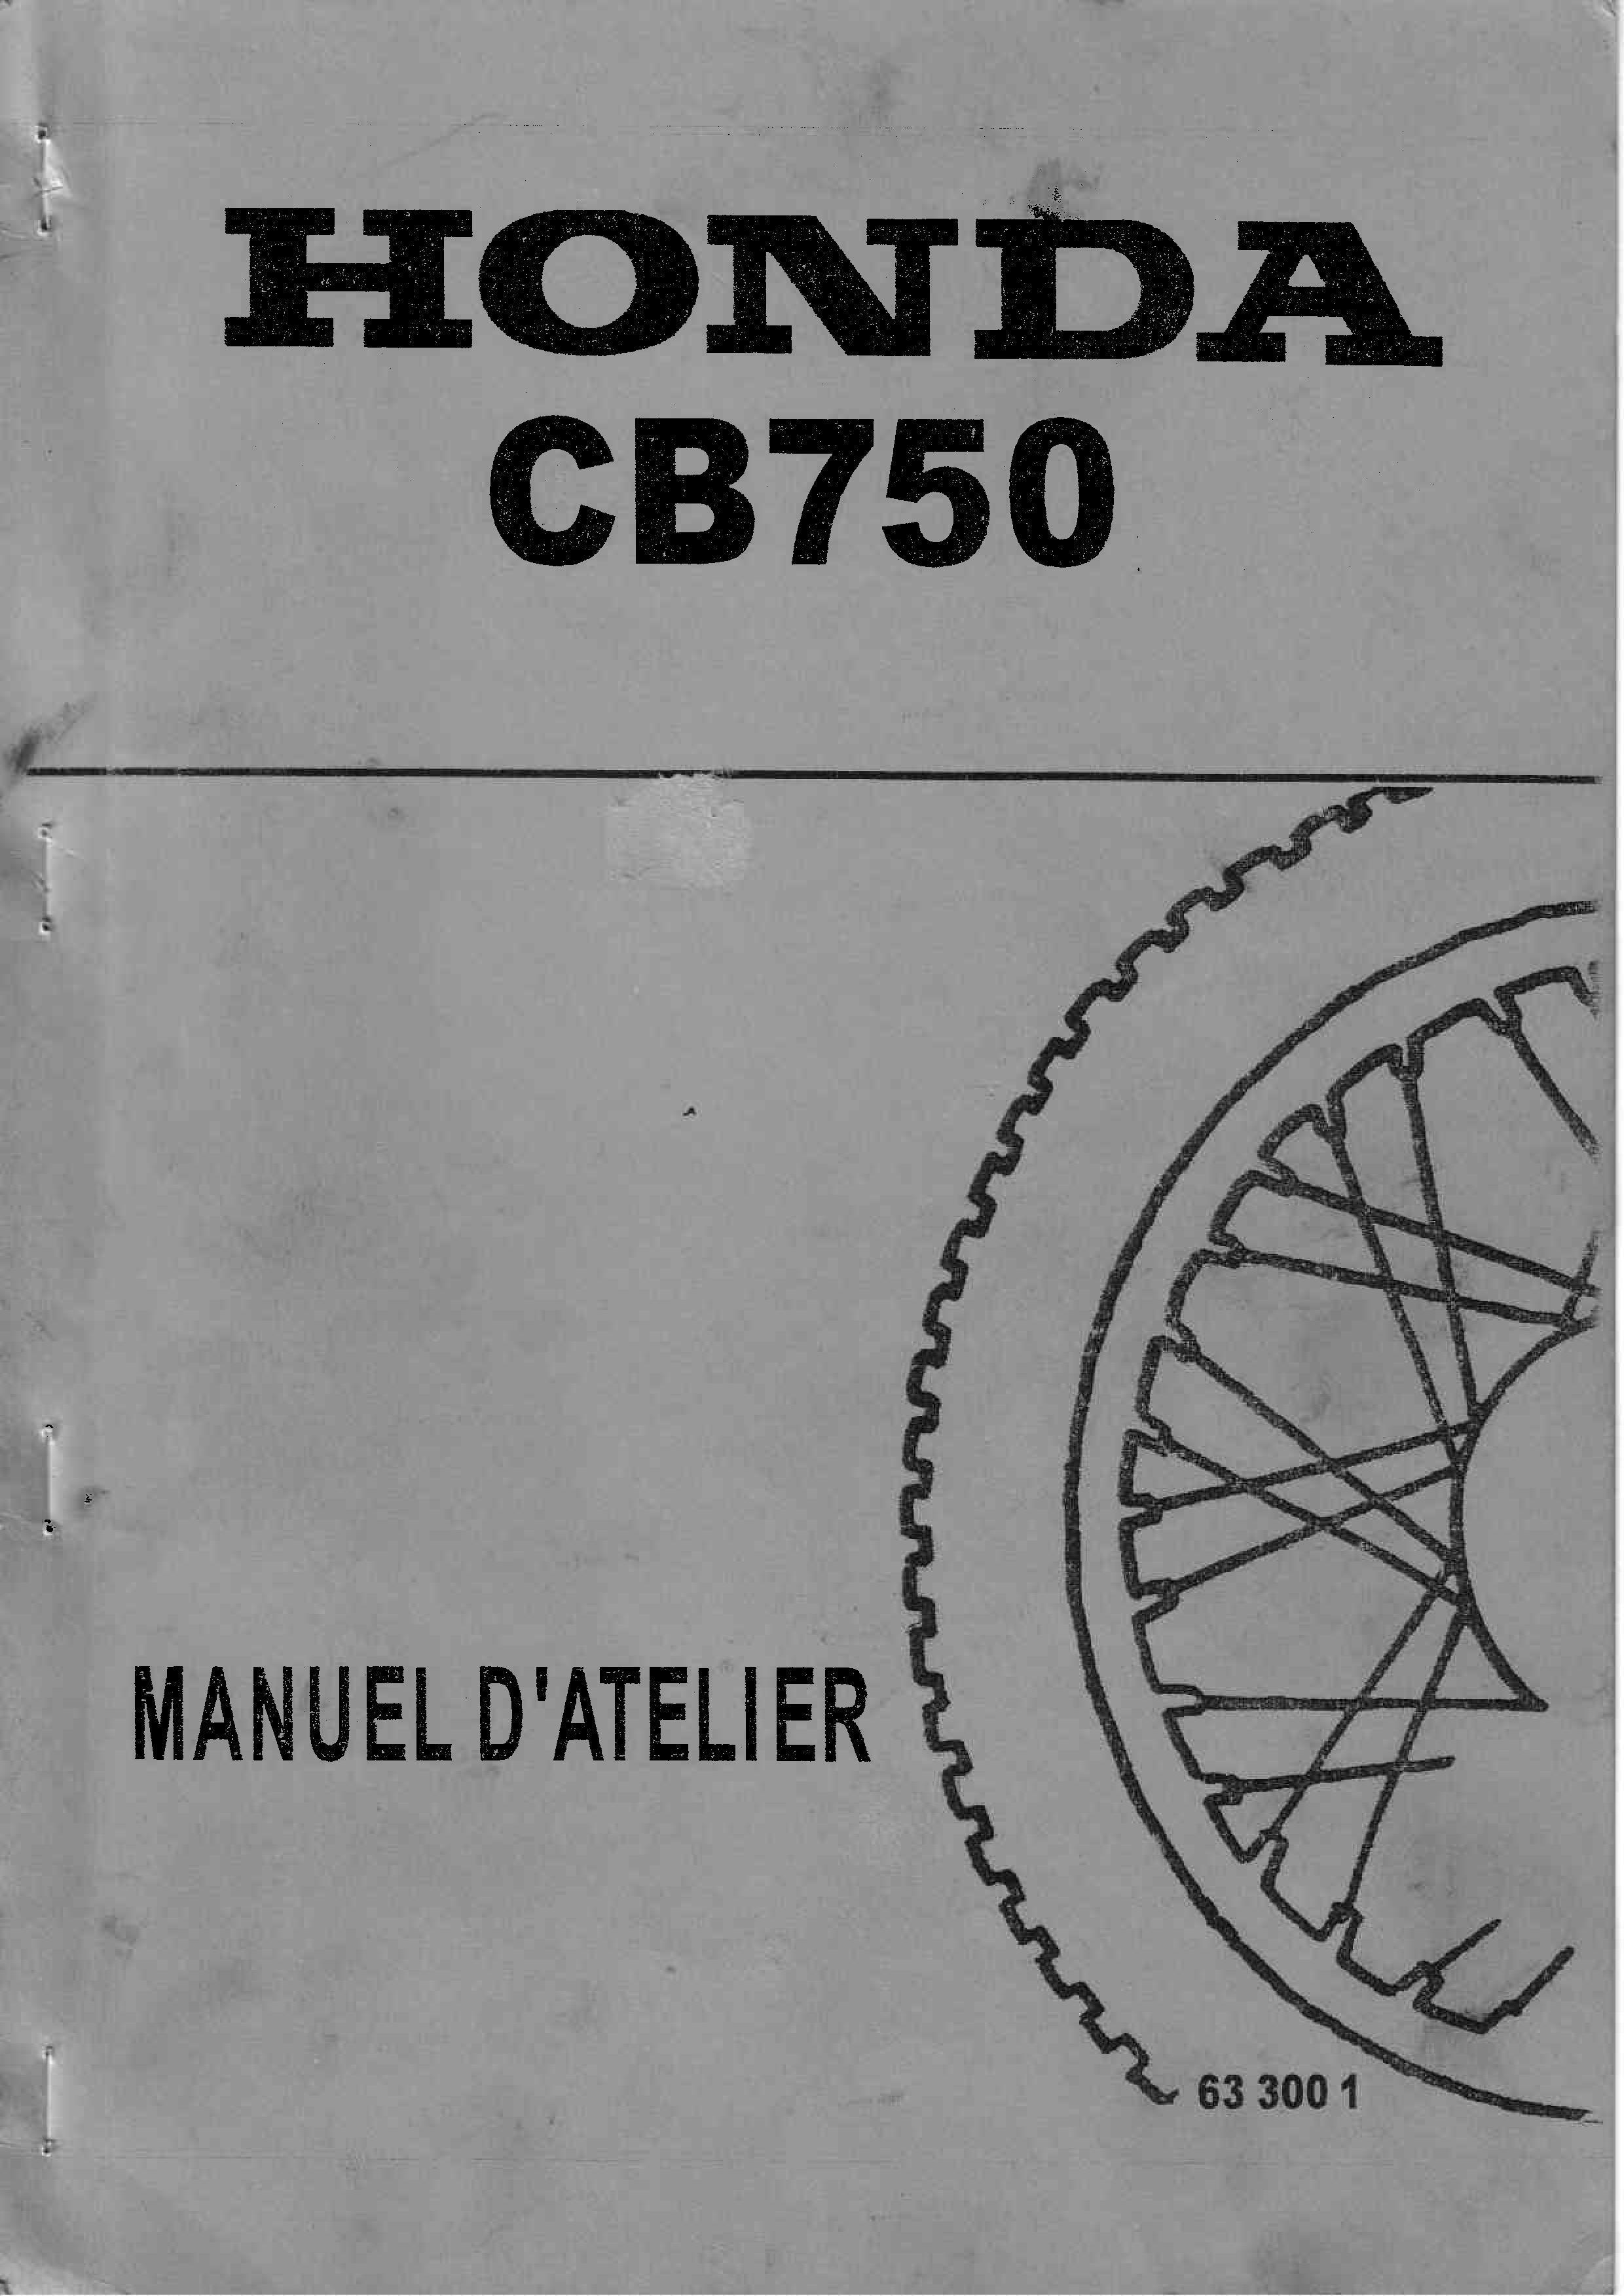 Workshopmanual for Honda CB750 (French)